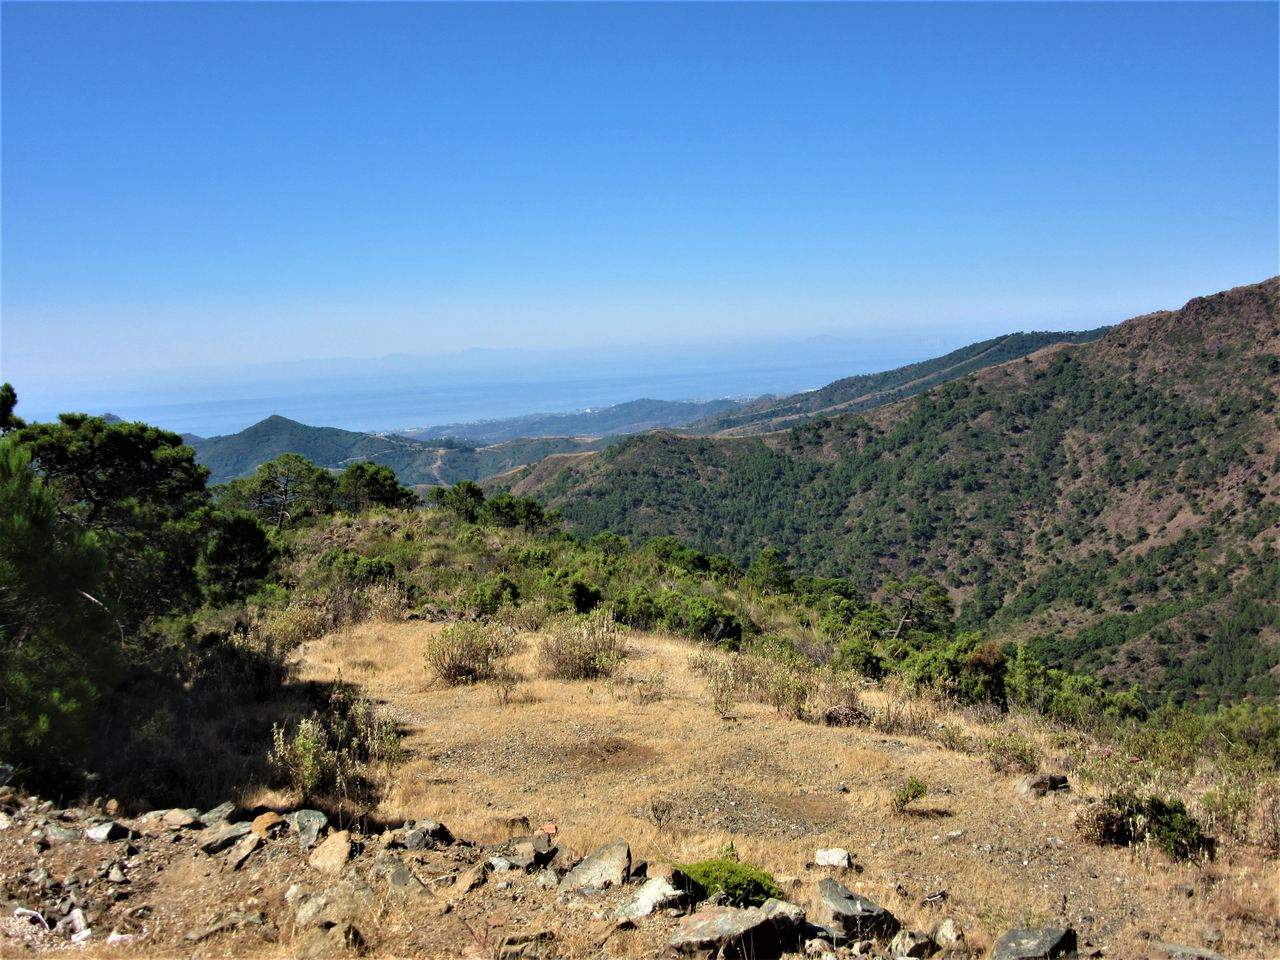 Sierra Ronda